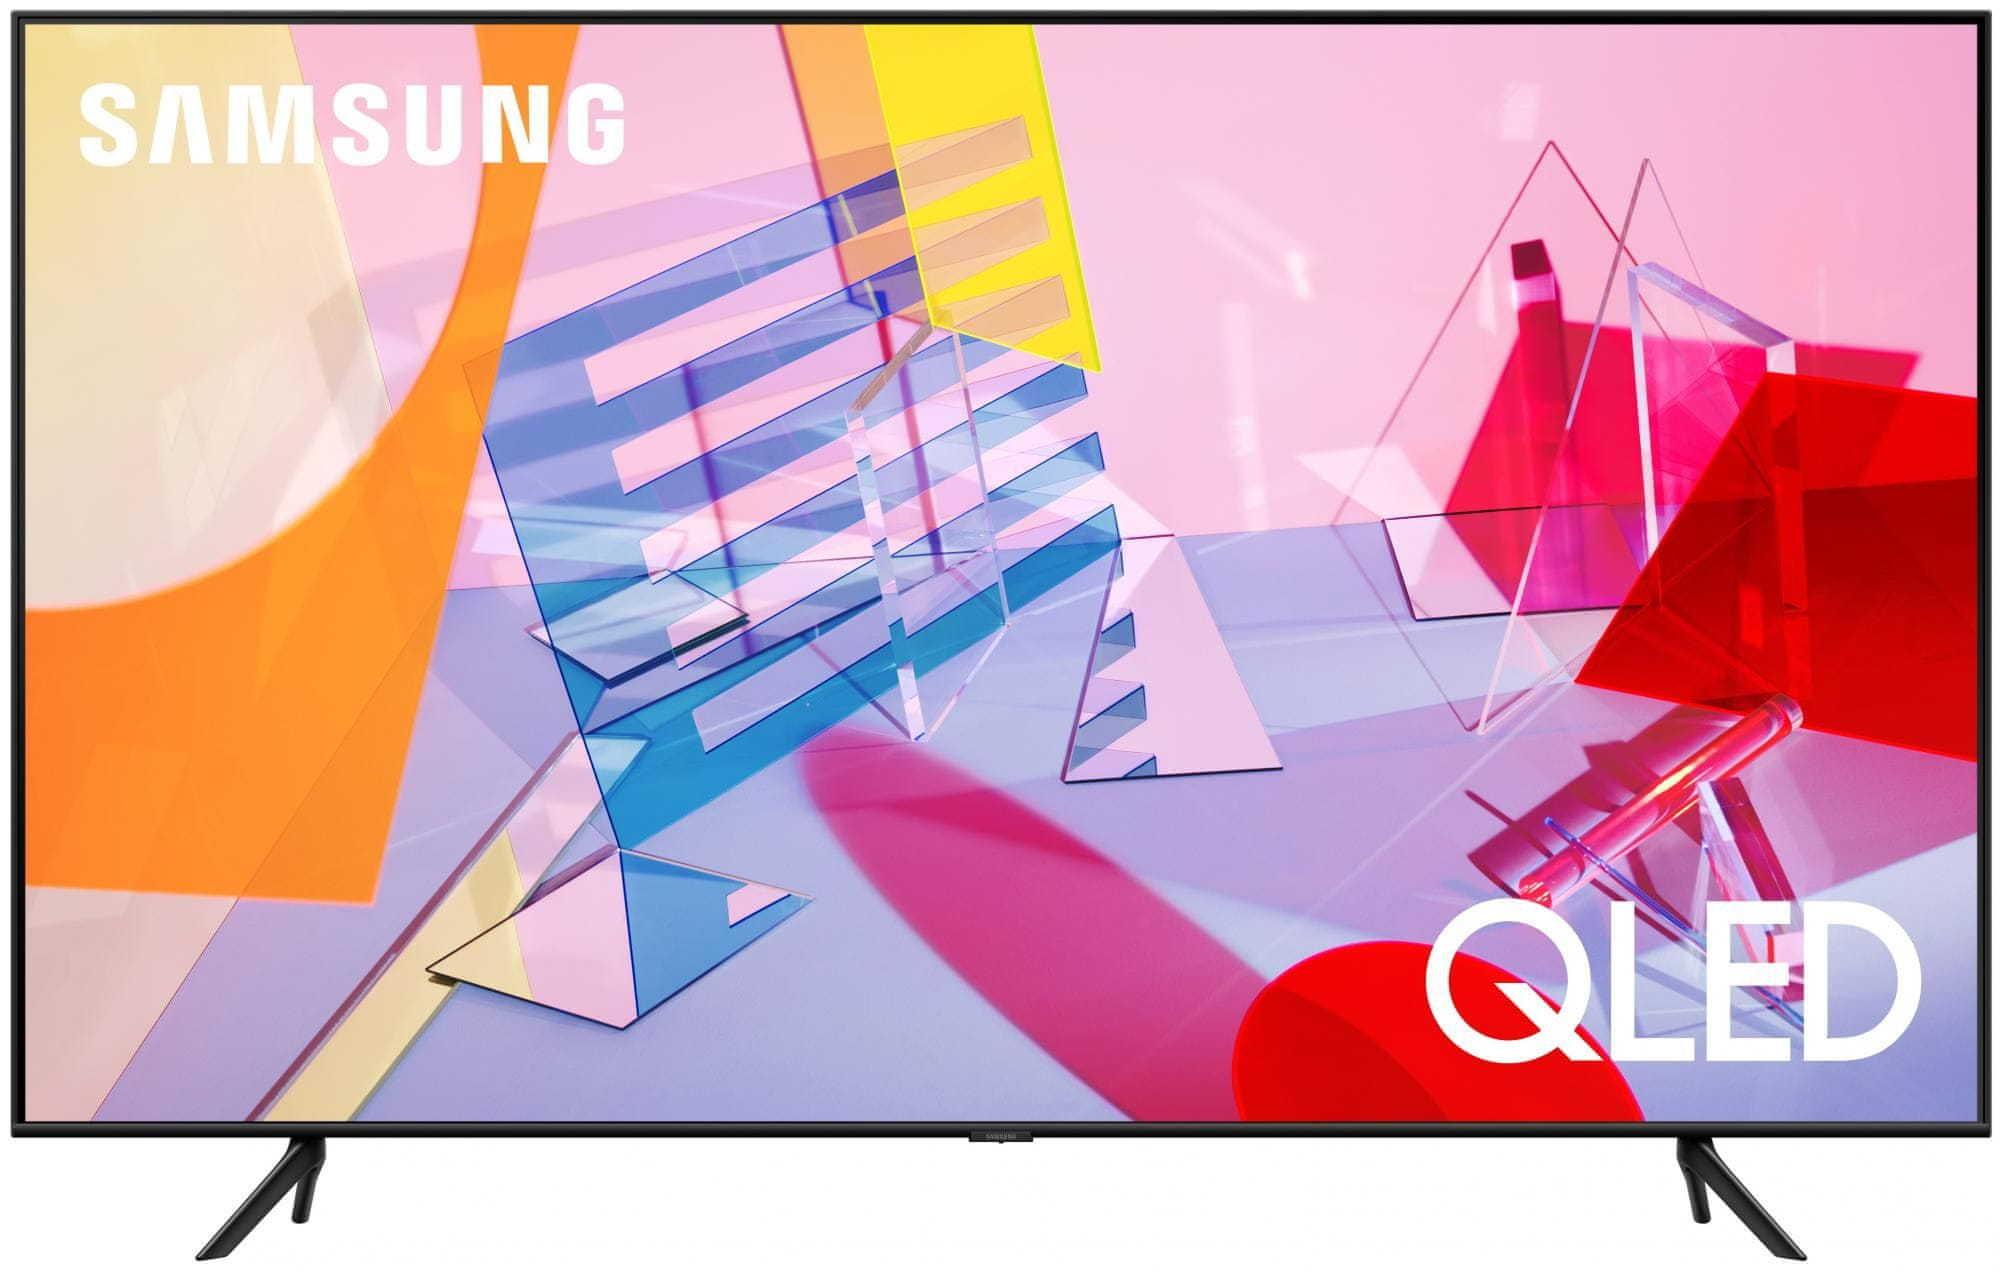 Samsung 43Q60TAU 109 cm (43